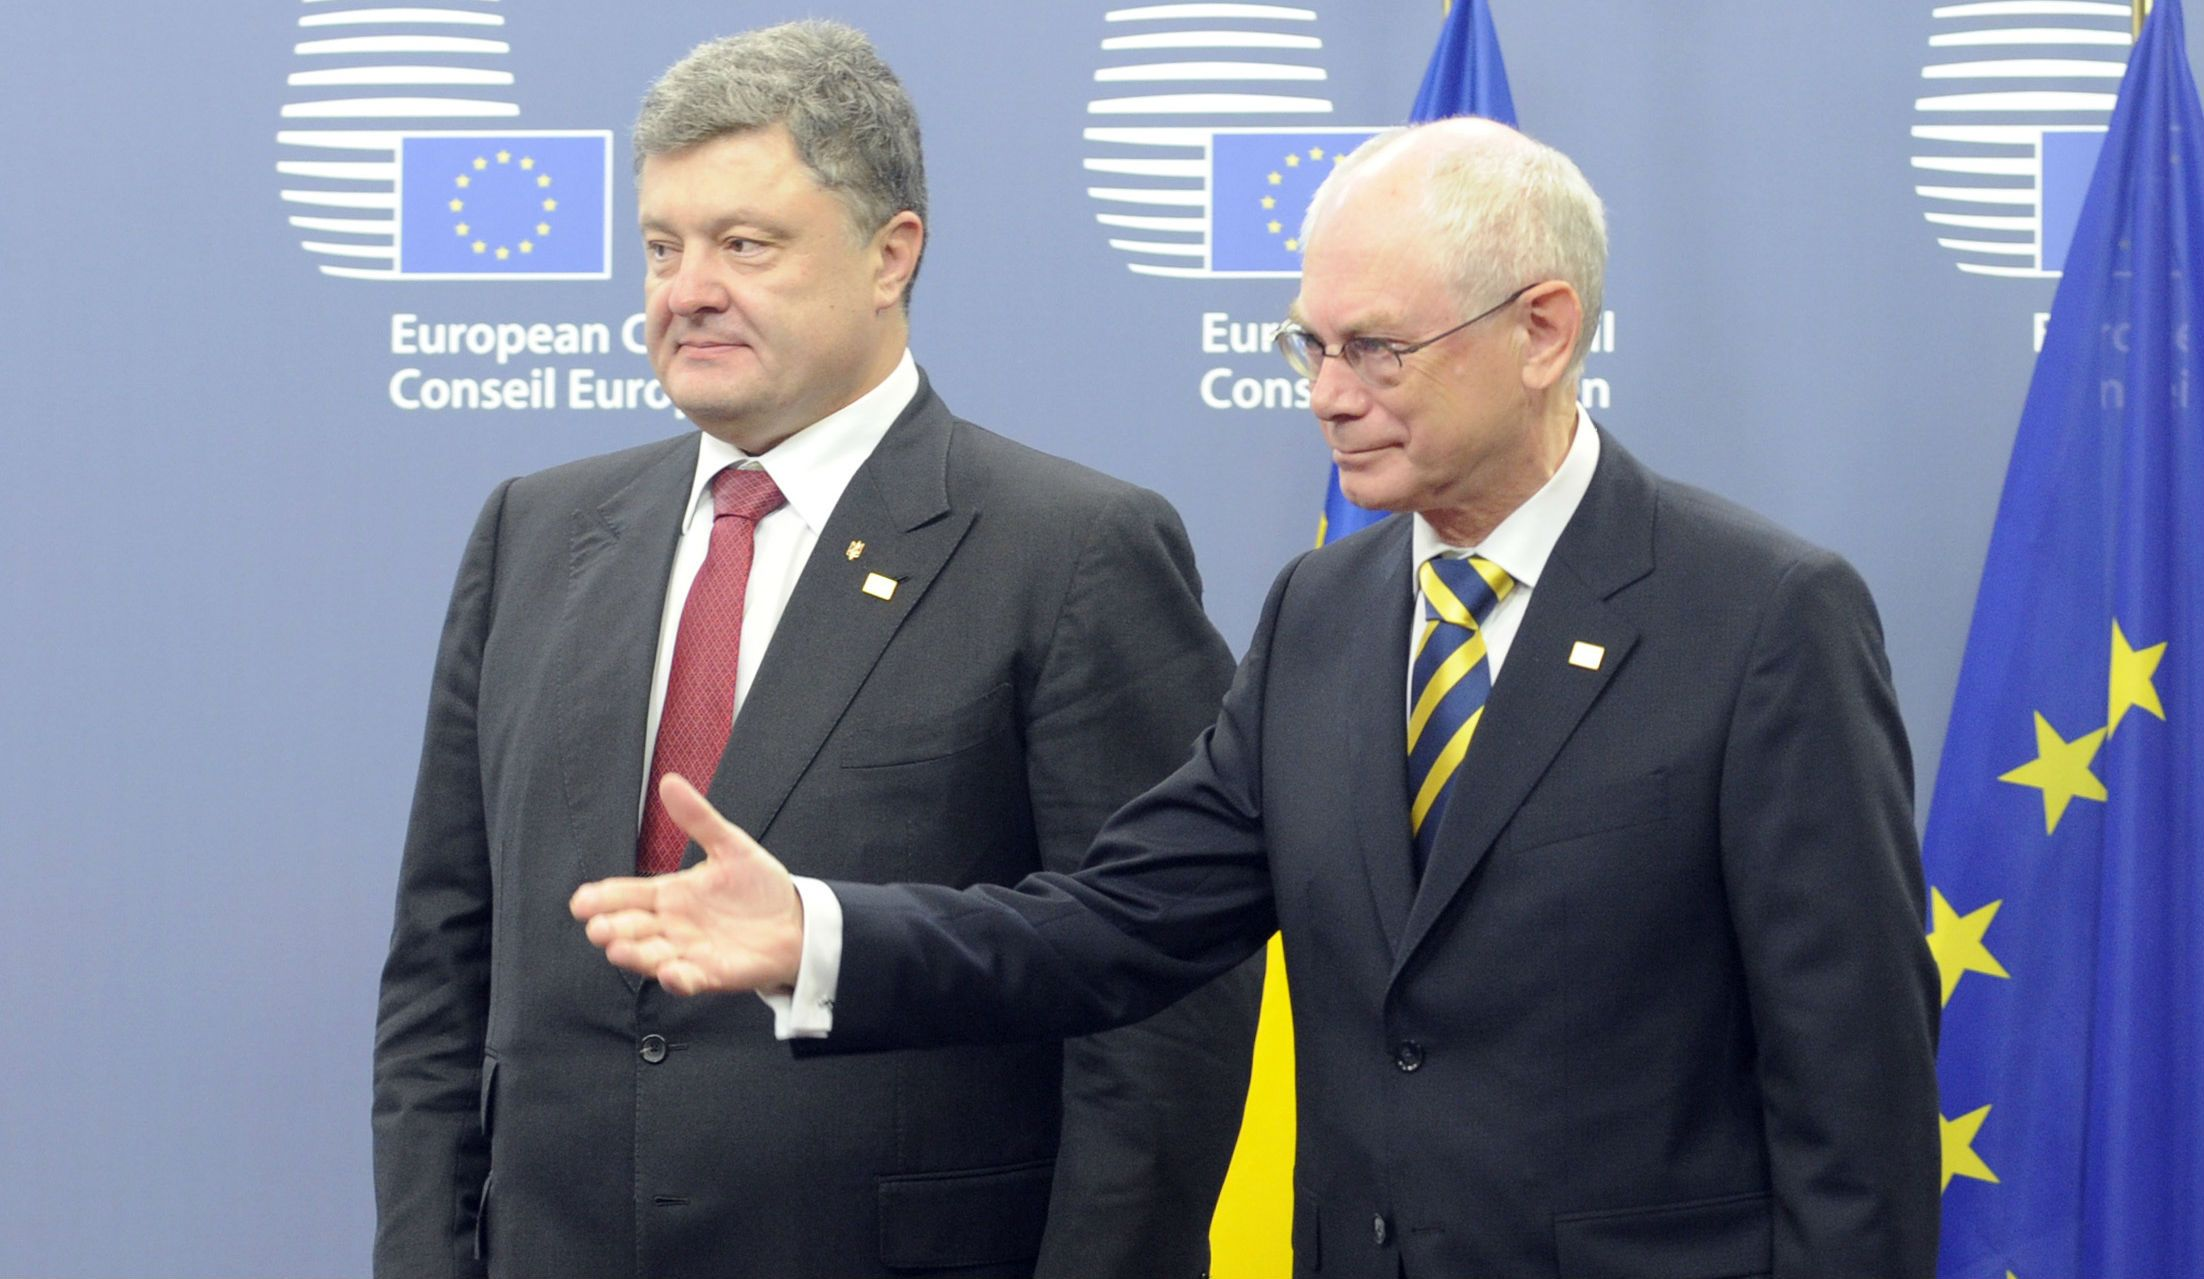 Poroshenko and Van Rompuy